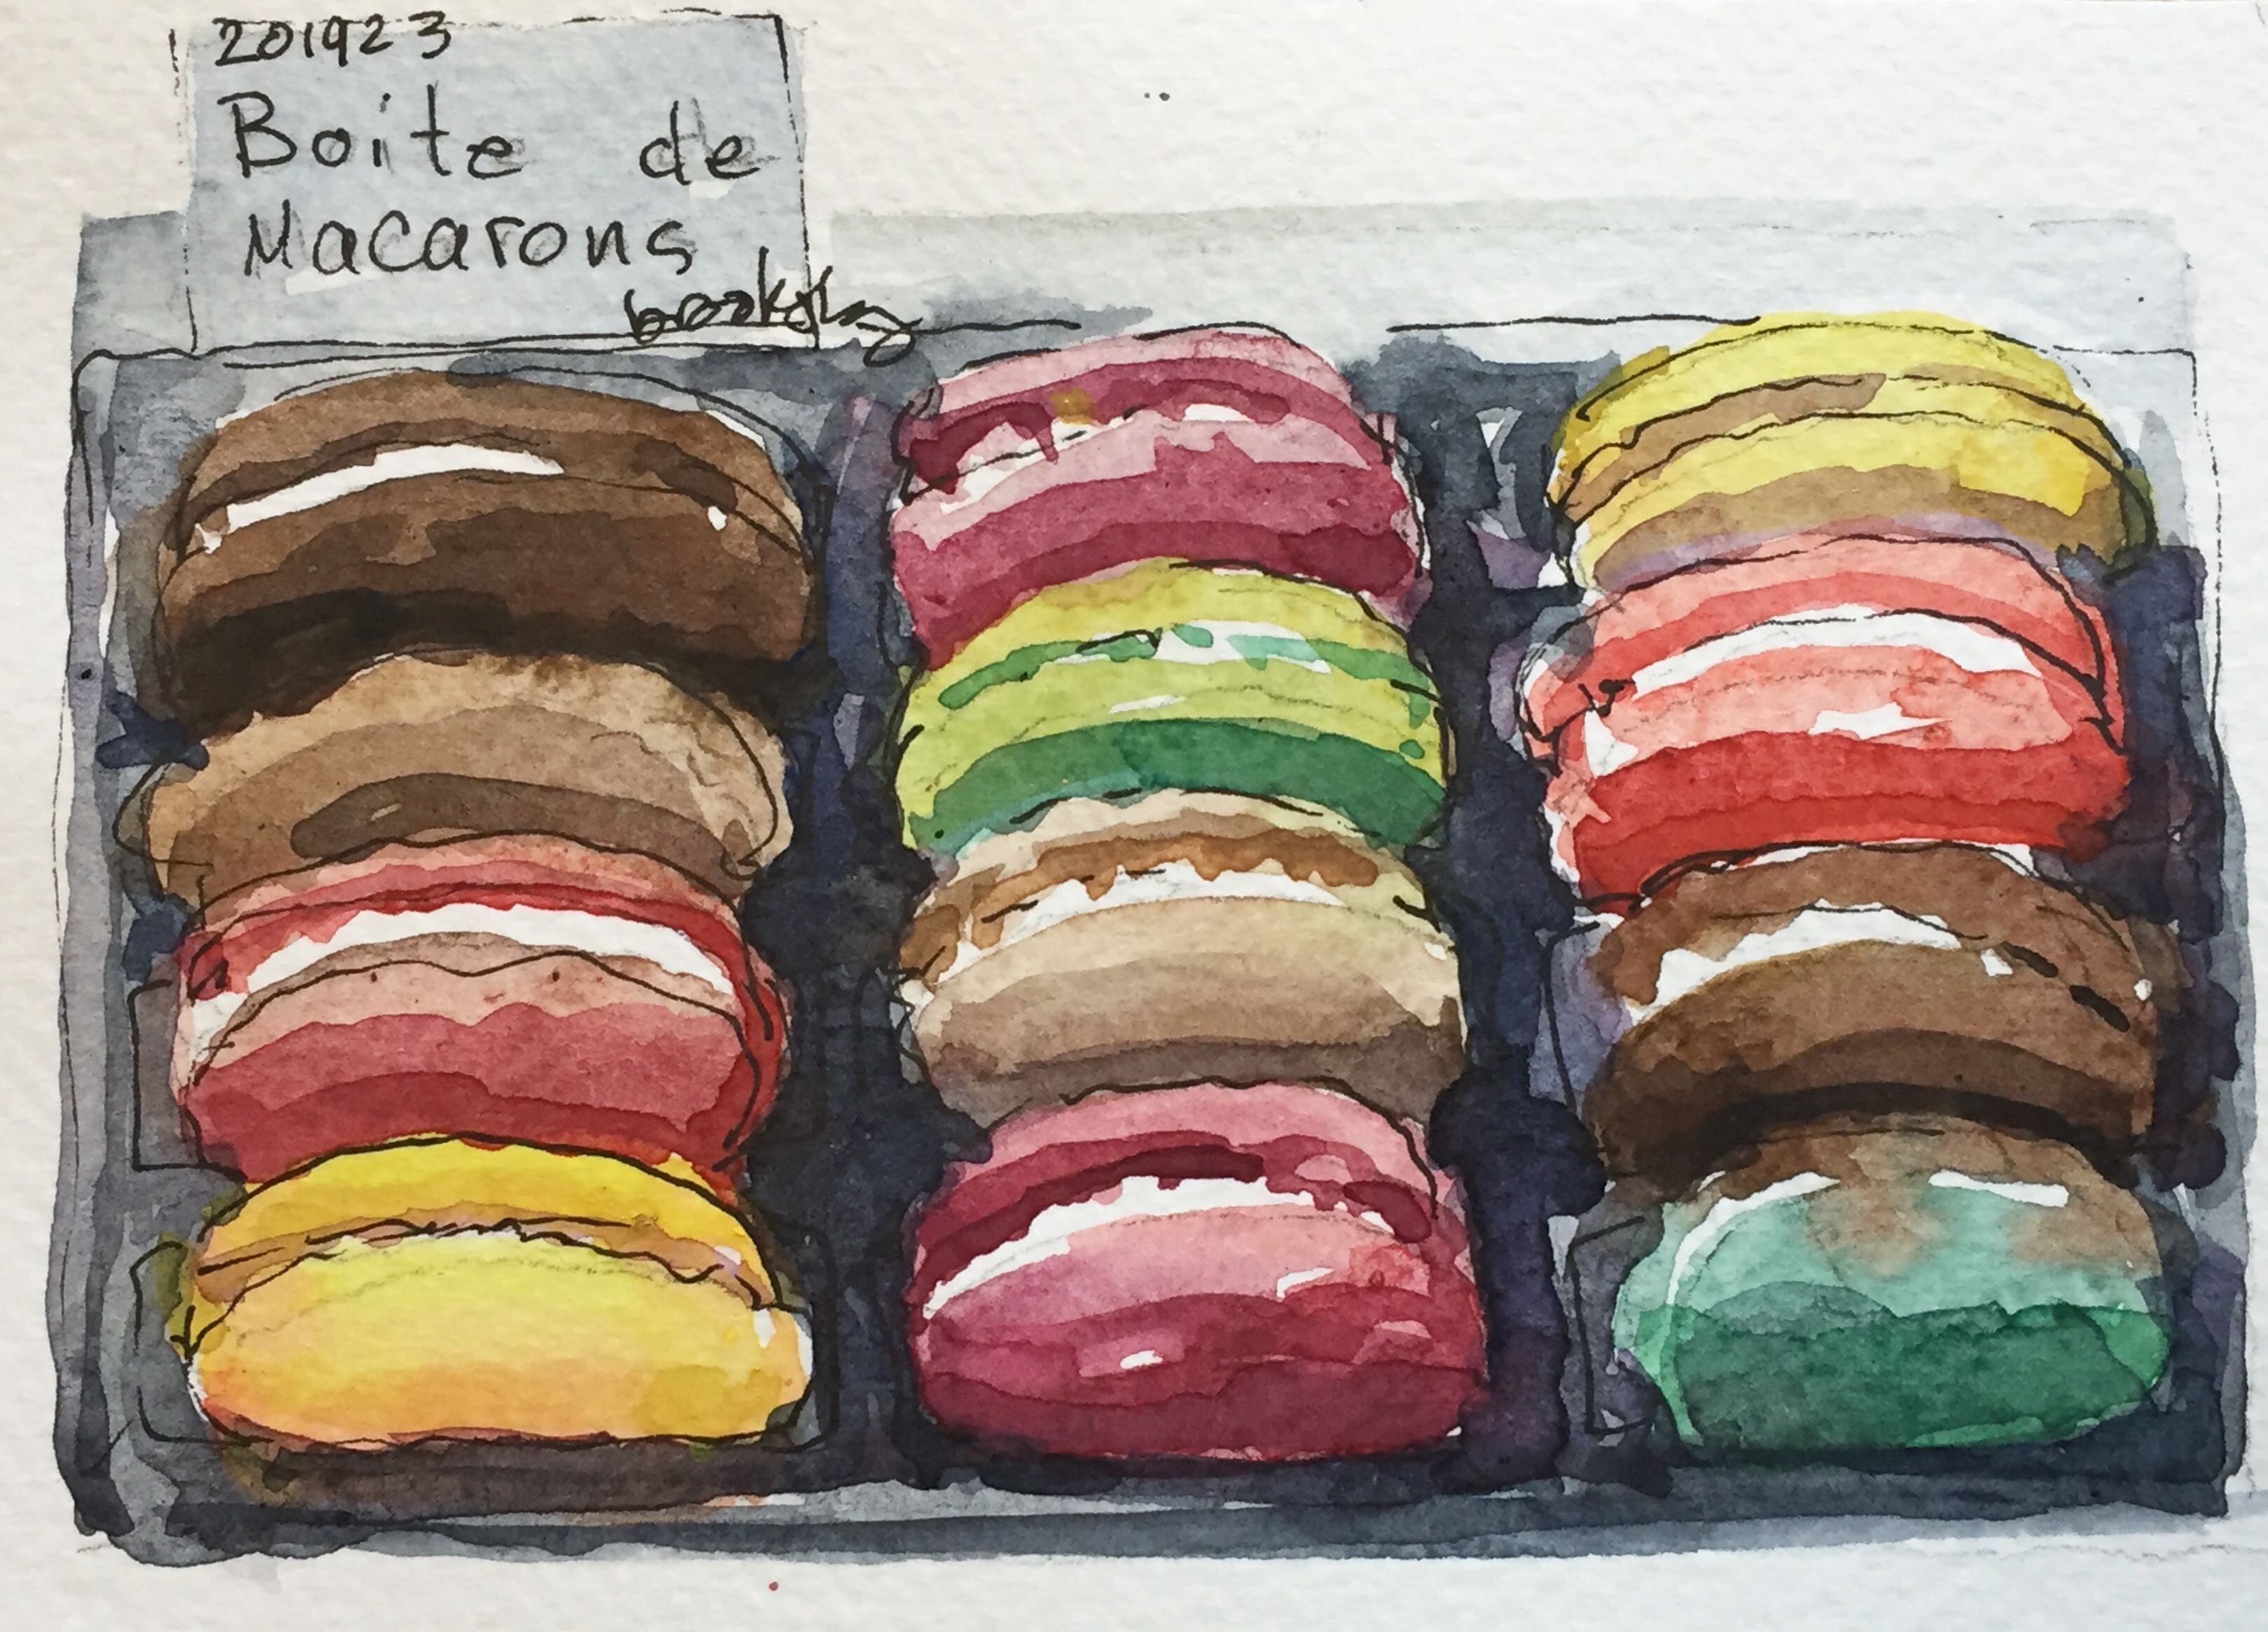 an illustration of macarons